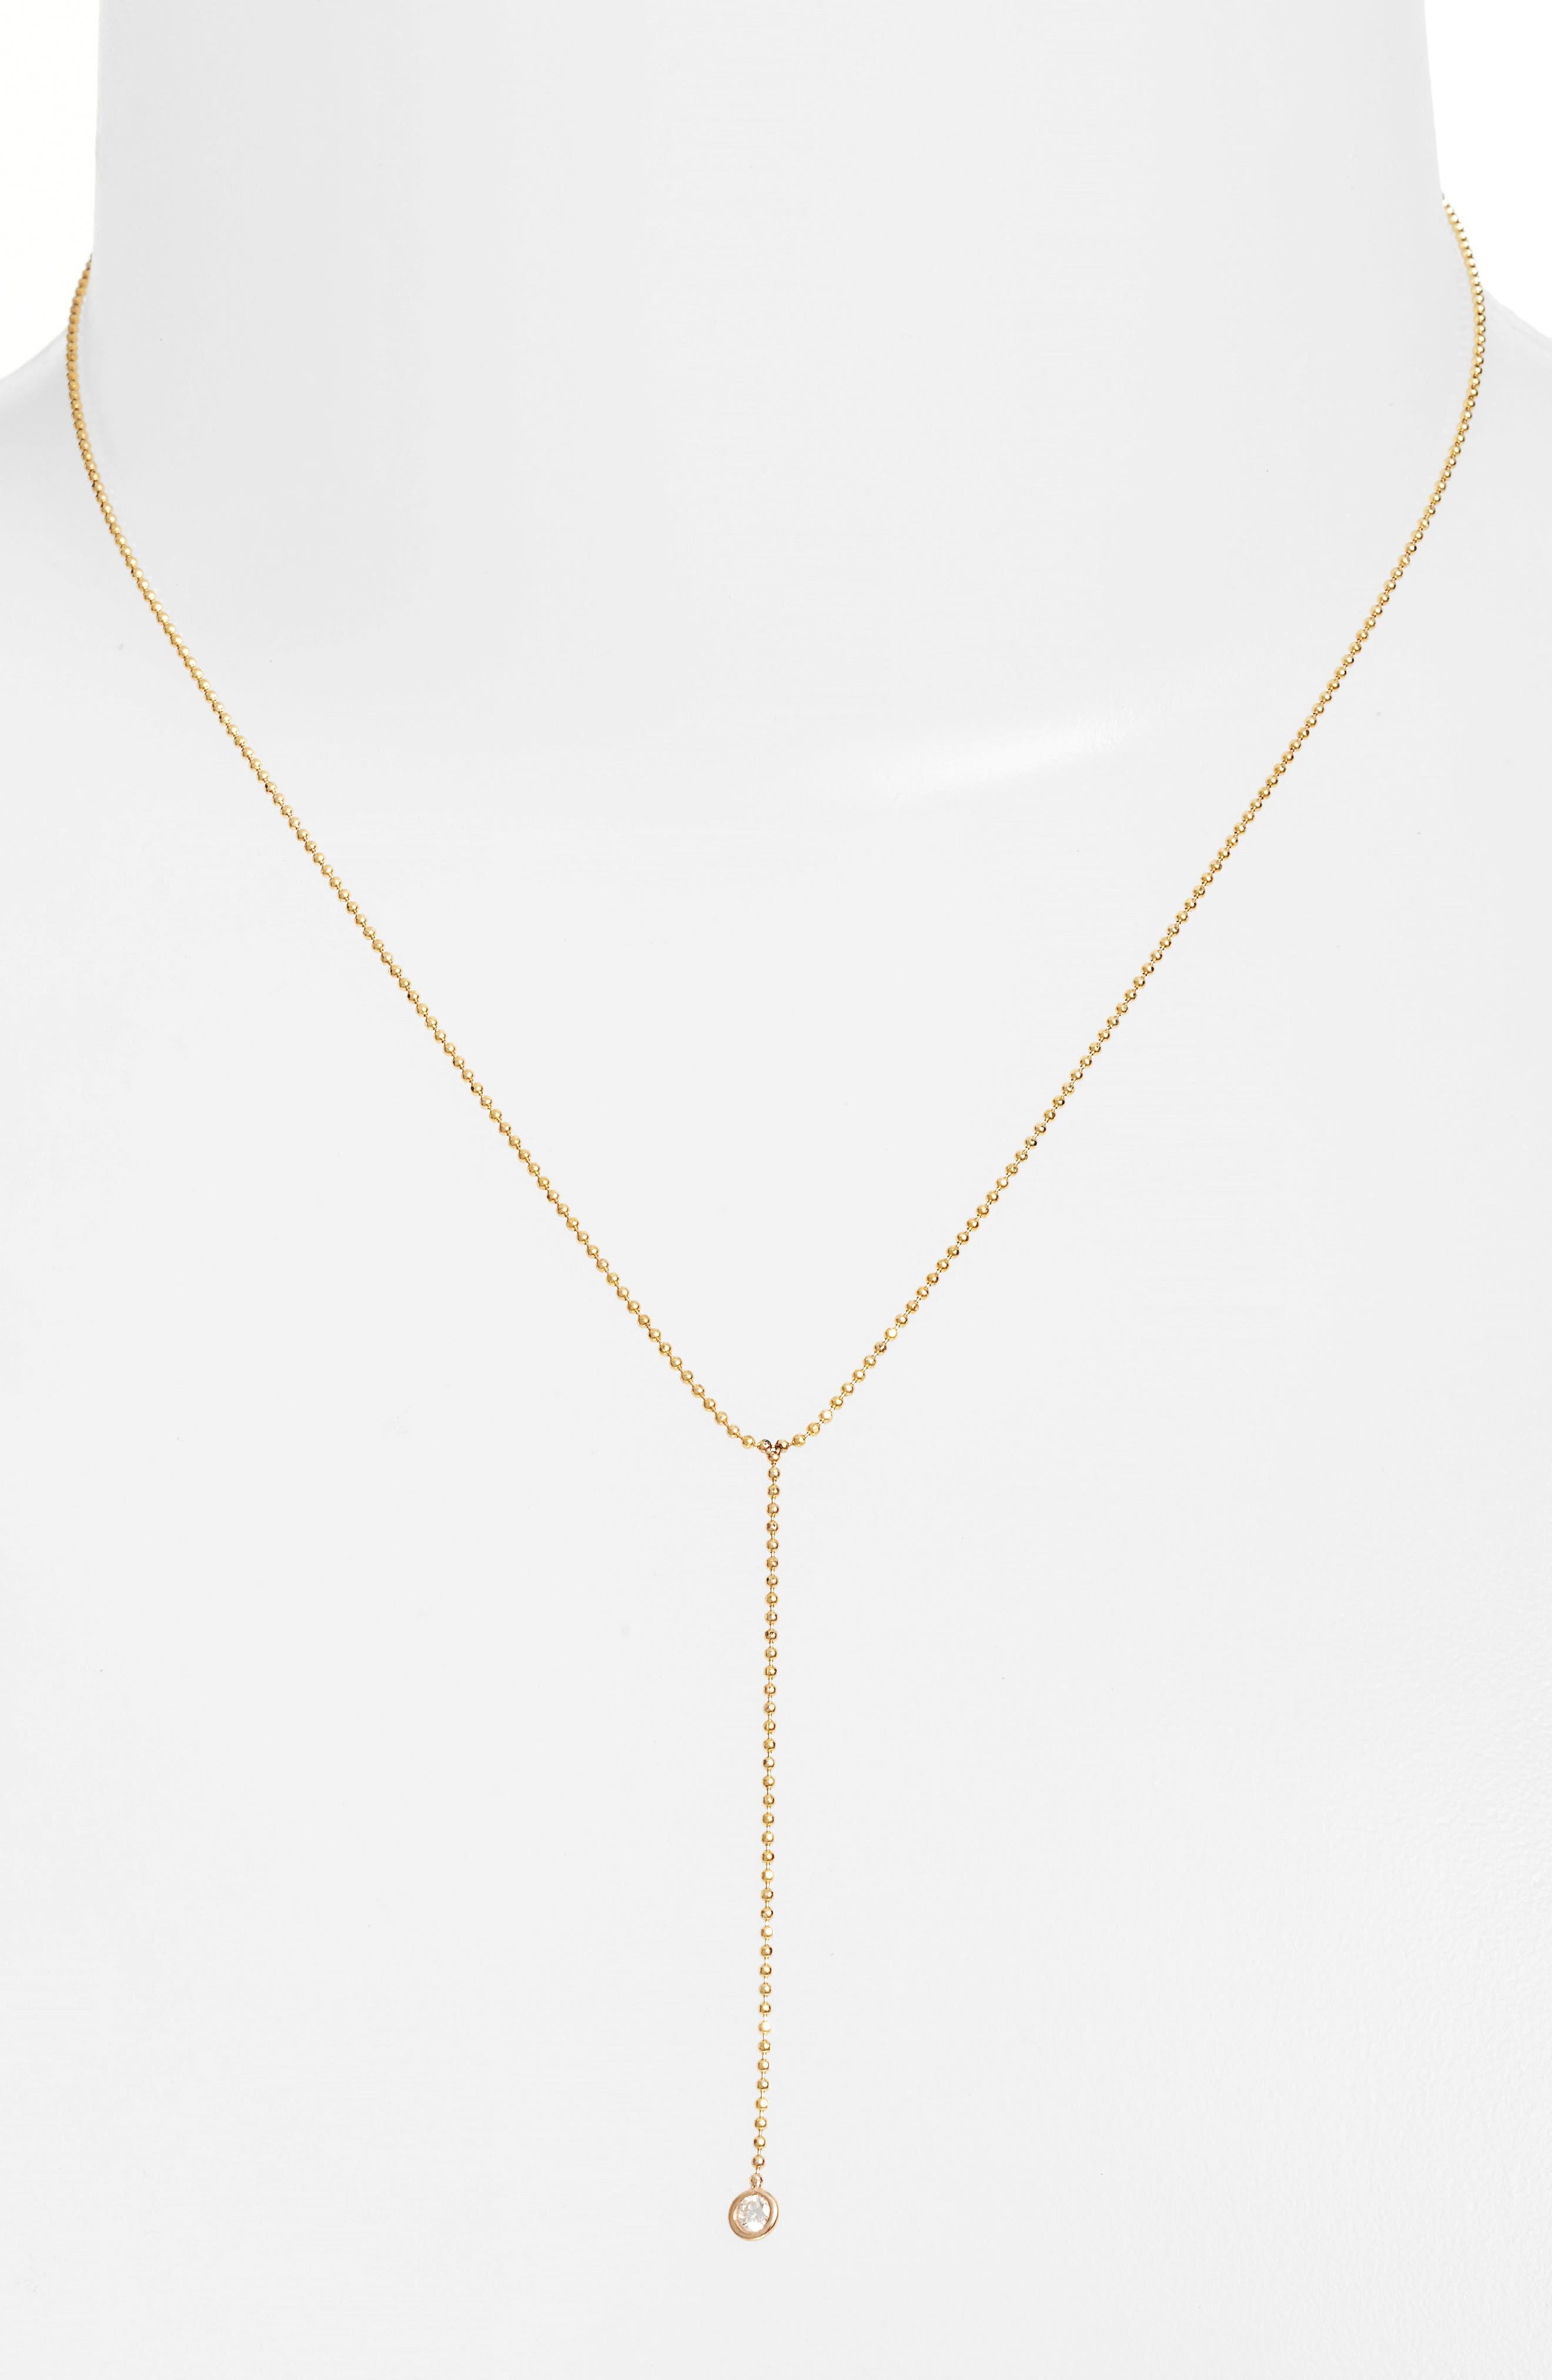 Main Image - Zoë Chicco Diamond Y-Necklace